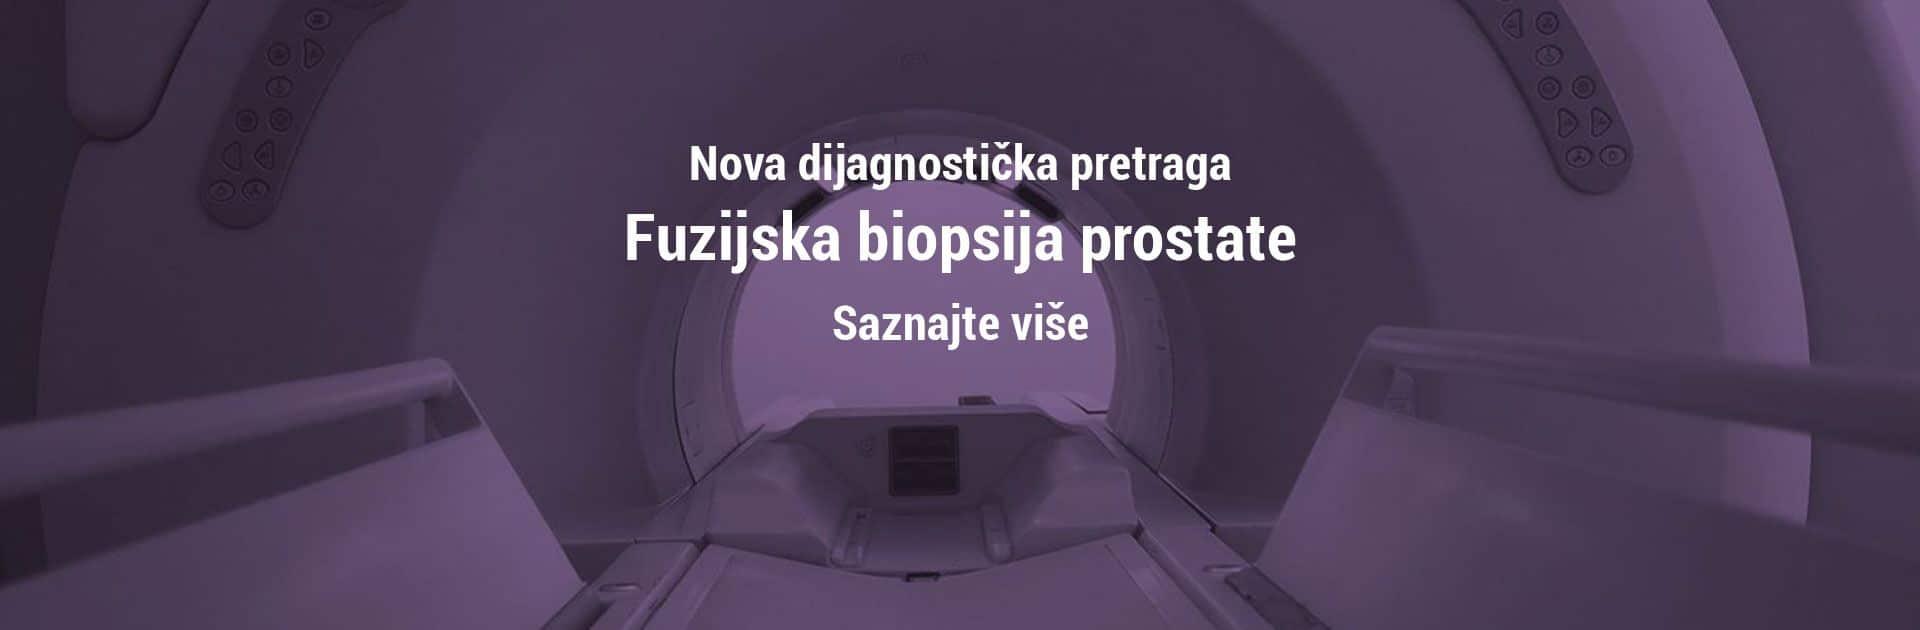 fuzijska biopsija prostate